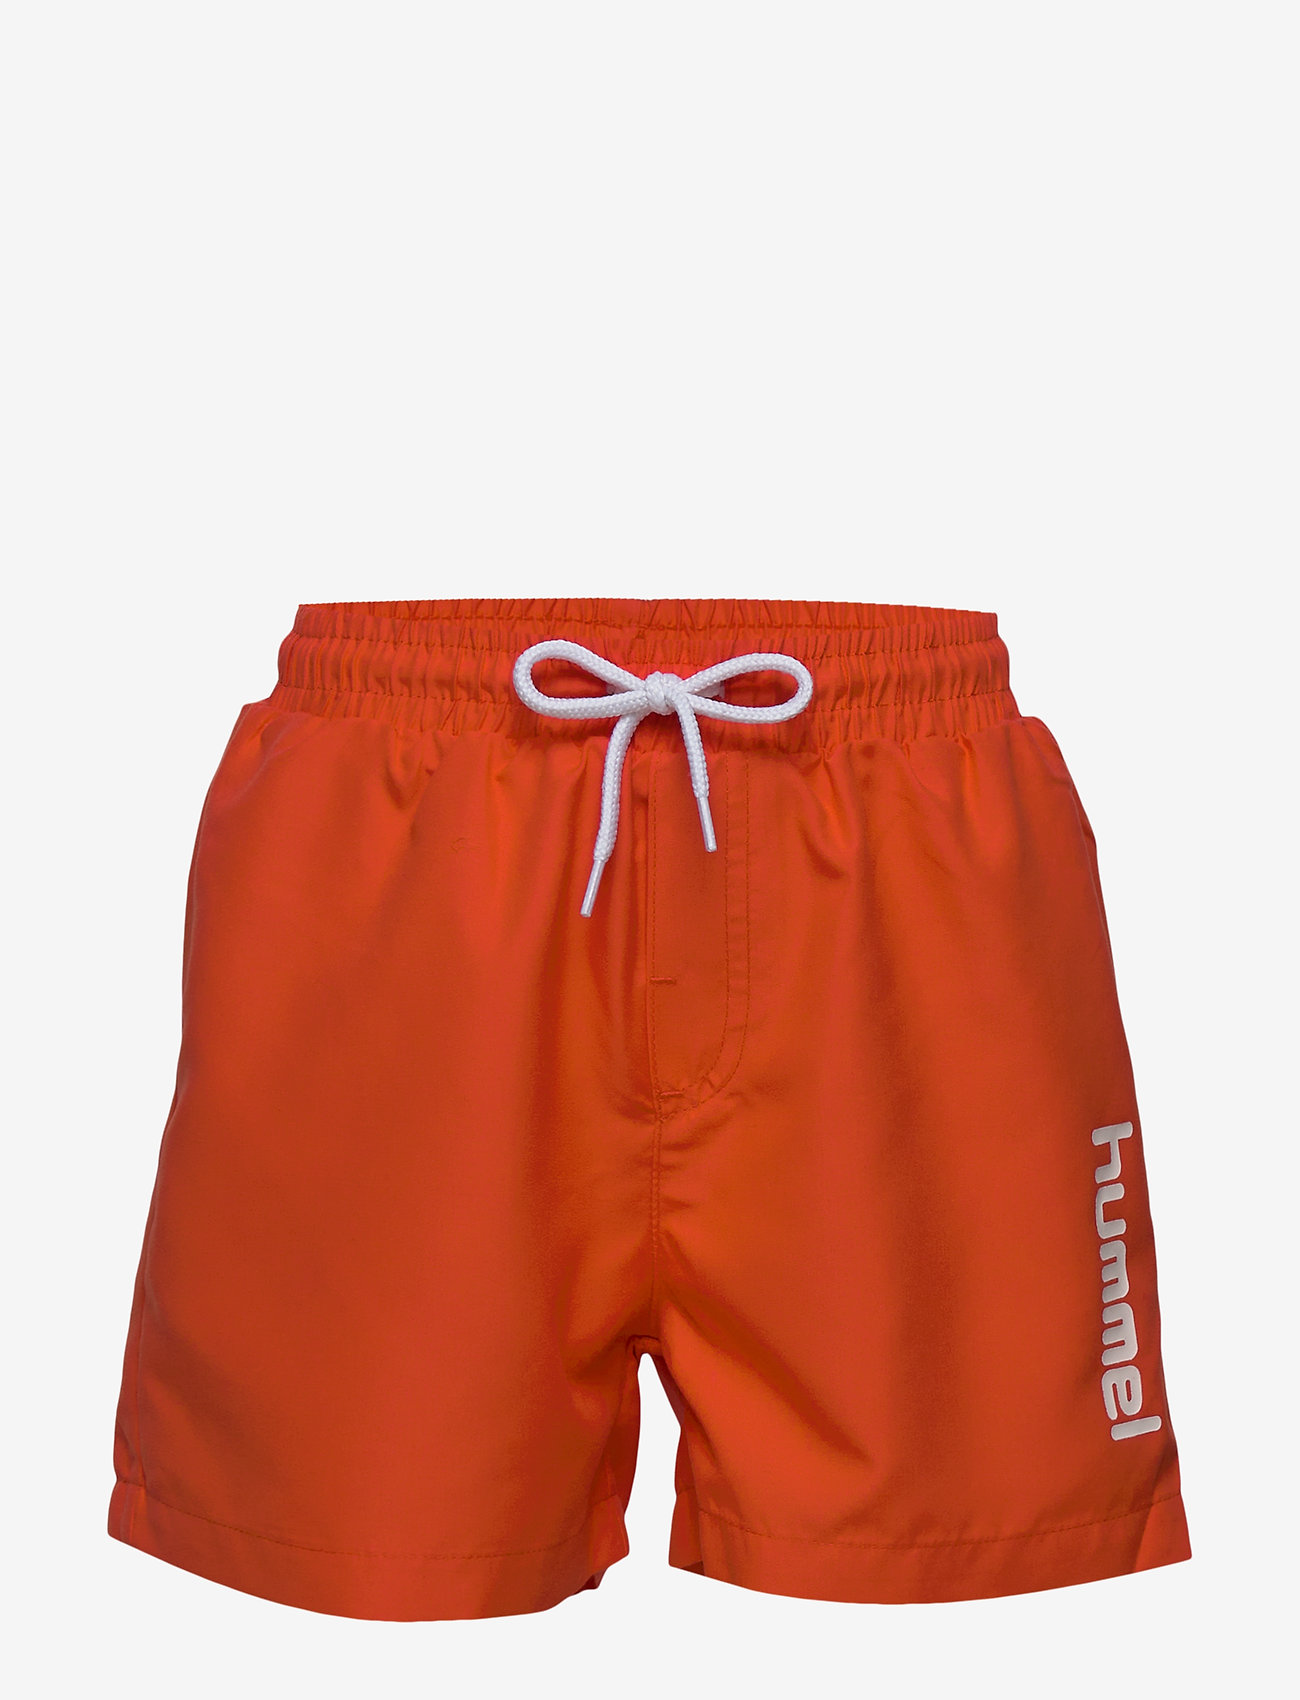 Hummel - hmlBONDI BOARD SHORTS - bademode - mandarin red - 0